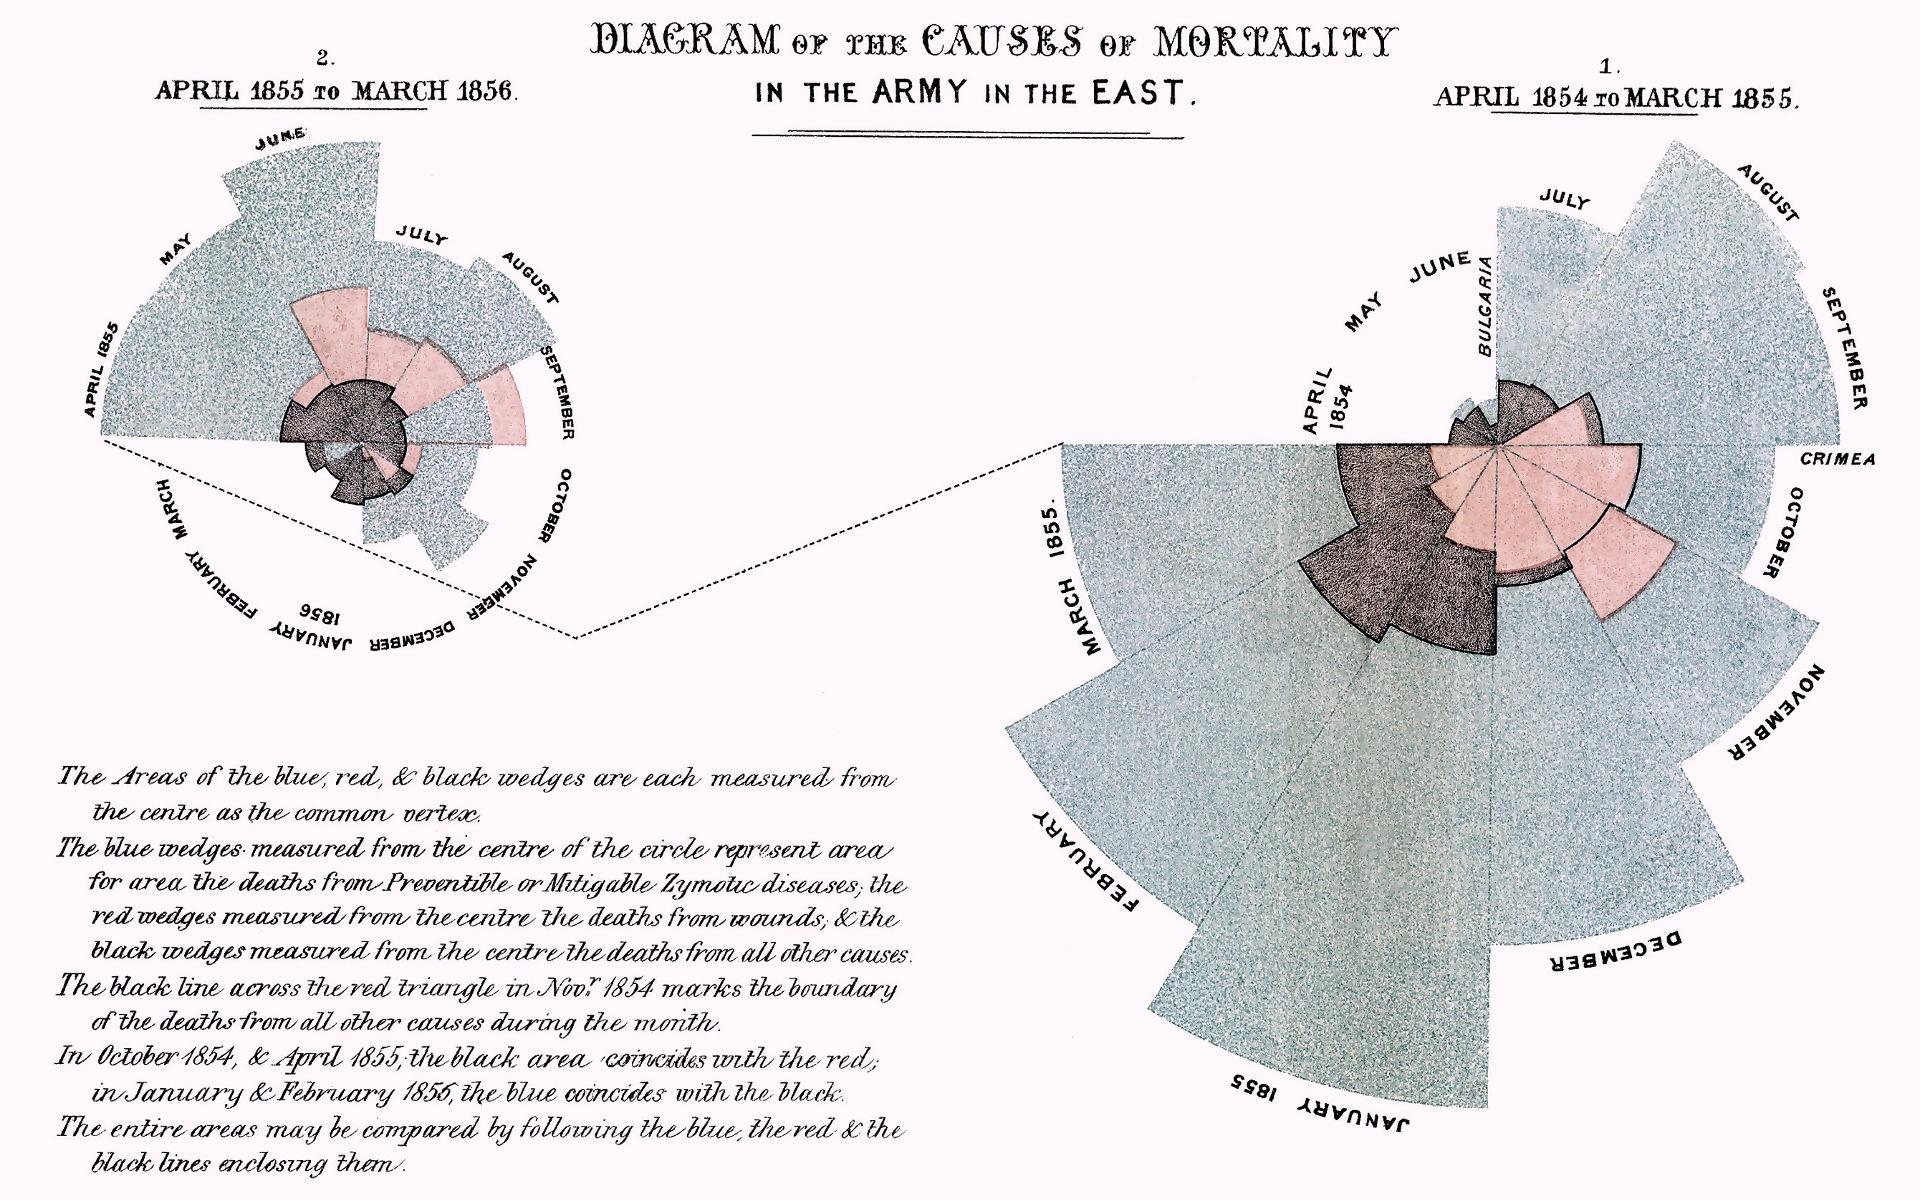 Florence Nightingale: Polar area diagrams of Causes of Mortality